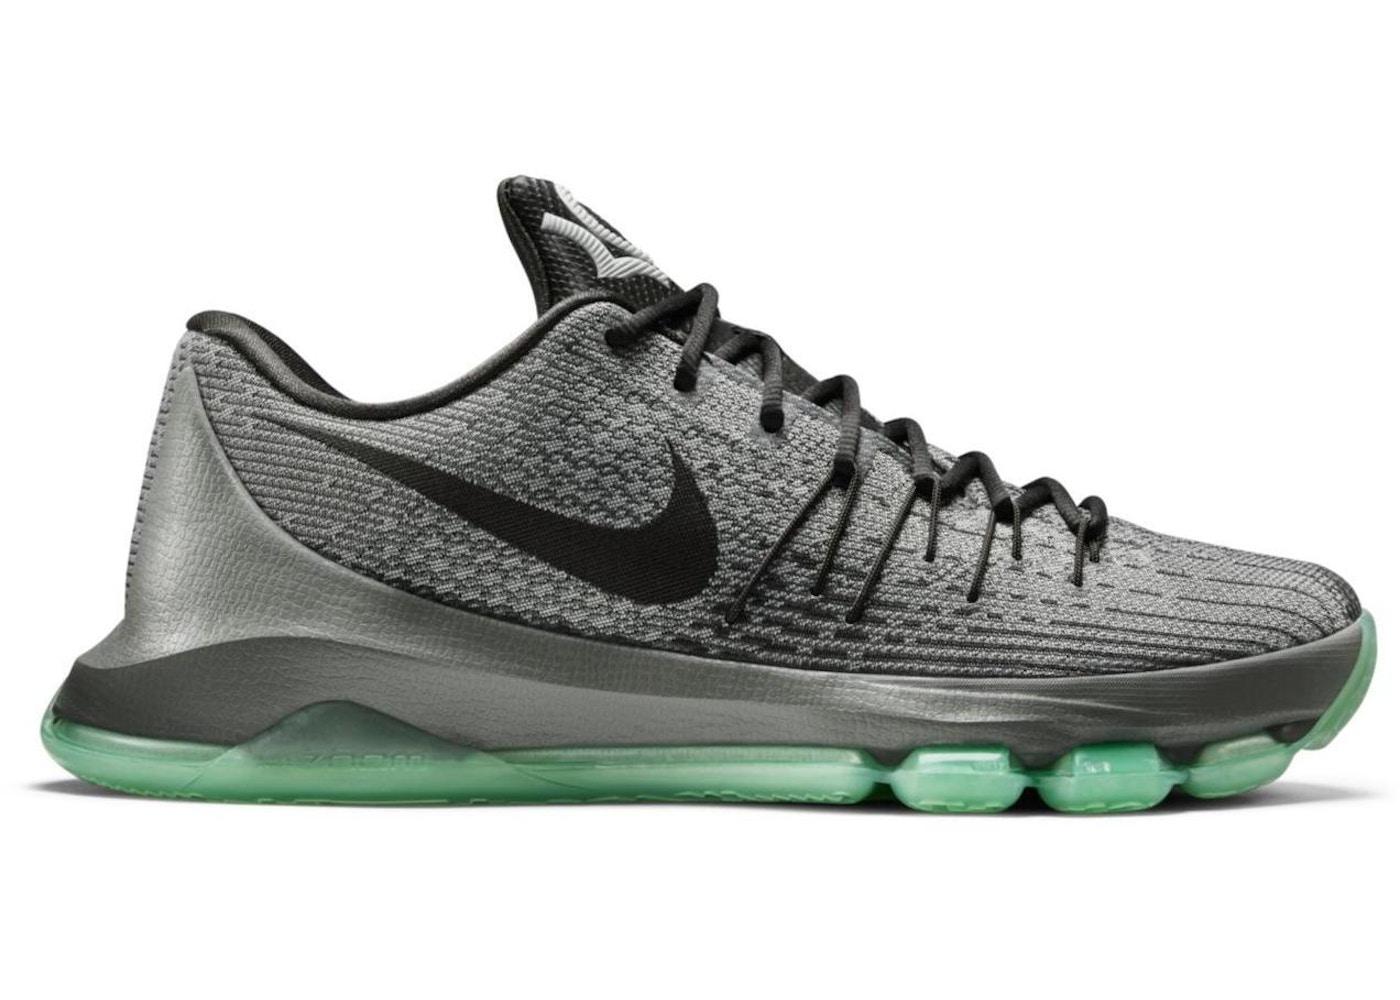 hot sale online 0c0da f4af0 Buy Nike KD 8 Shoes & Deadstock Sneakers